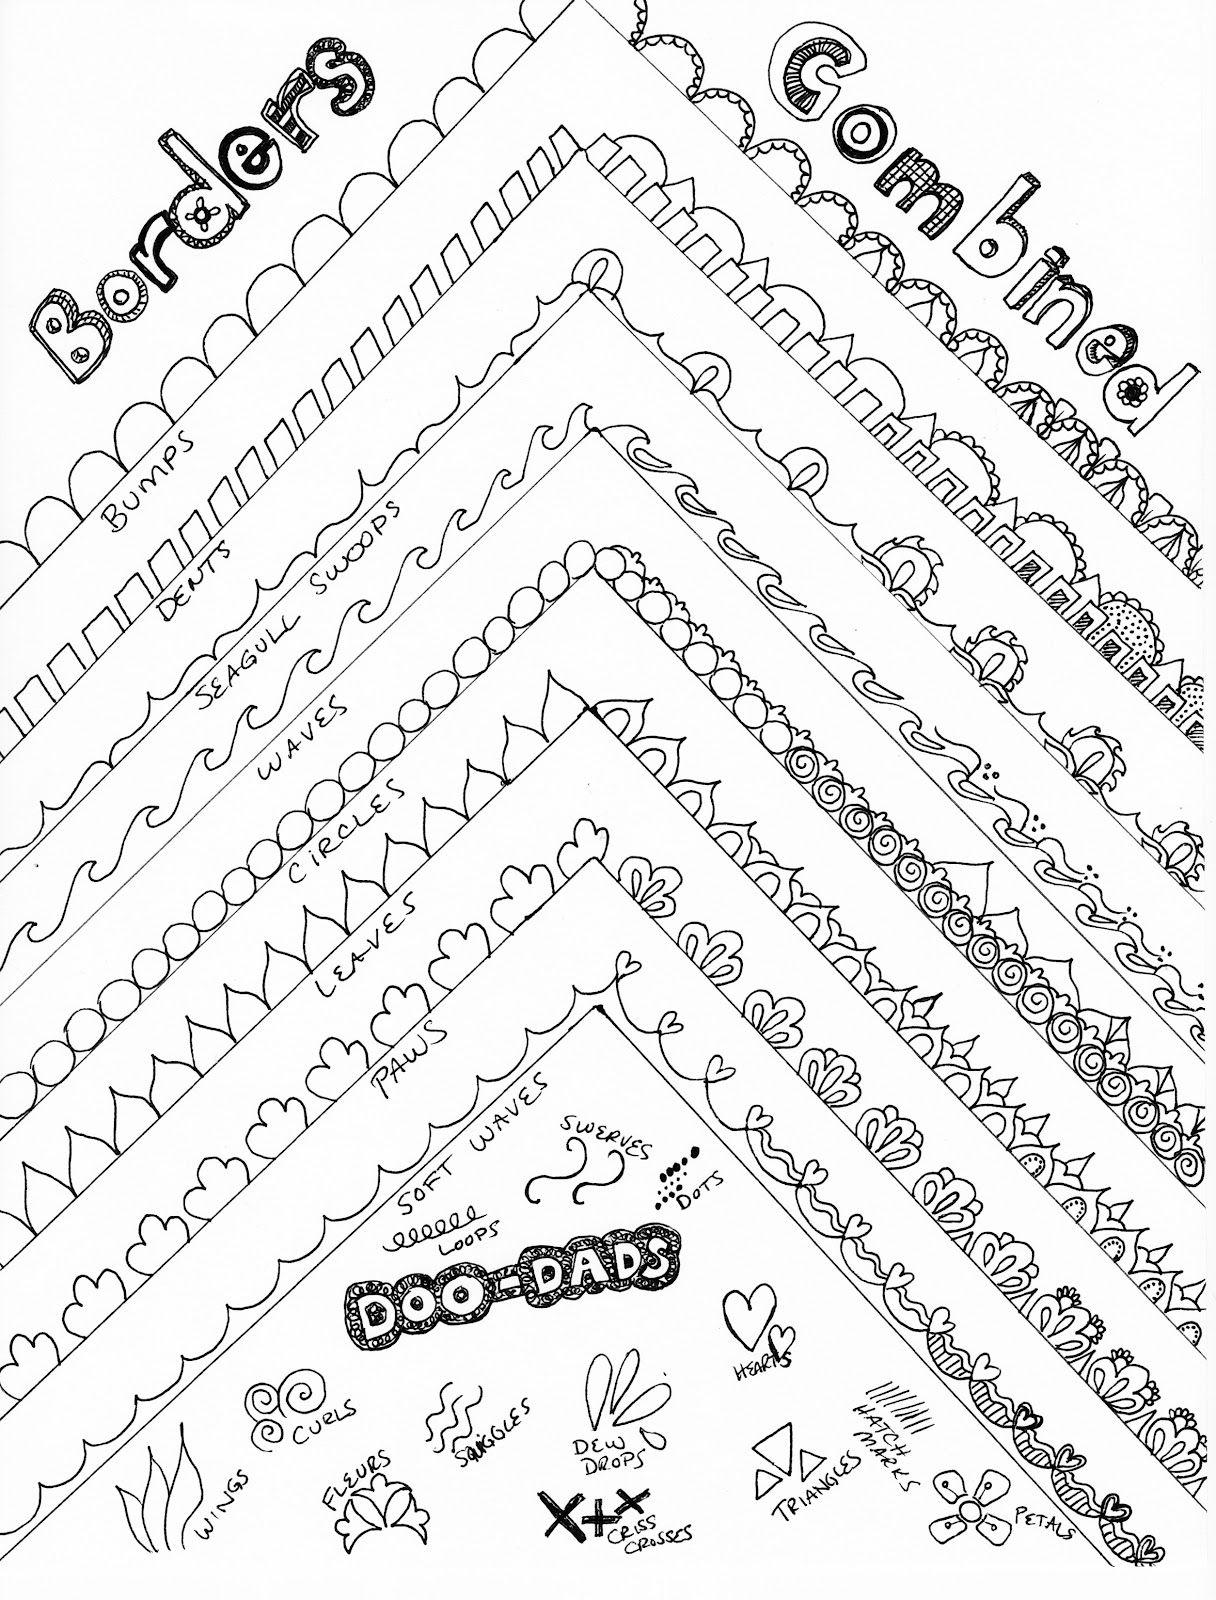 Fancy border drawing borders doodle easy mandala patterns also periwinkle paisley tutorial doodles manos dibujo mandalas dibujos rh ar pinterest